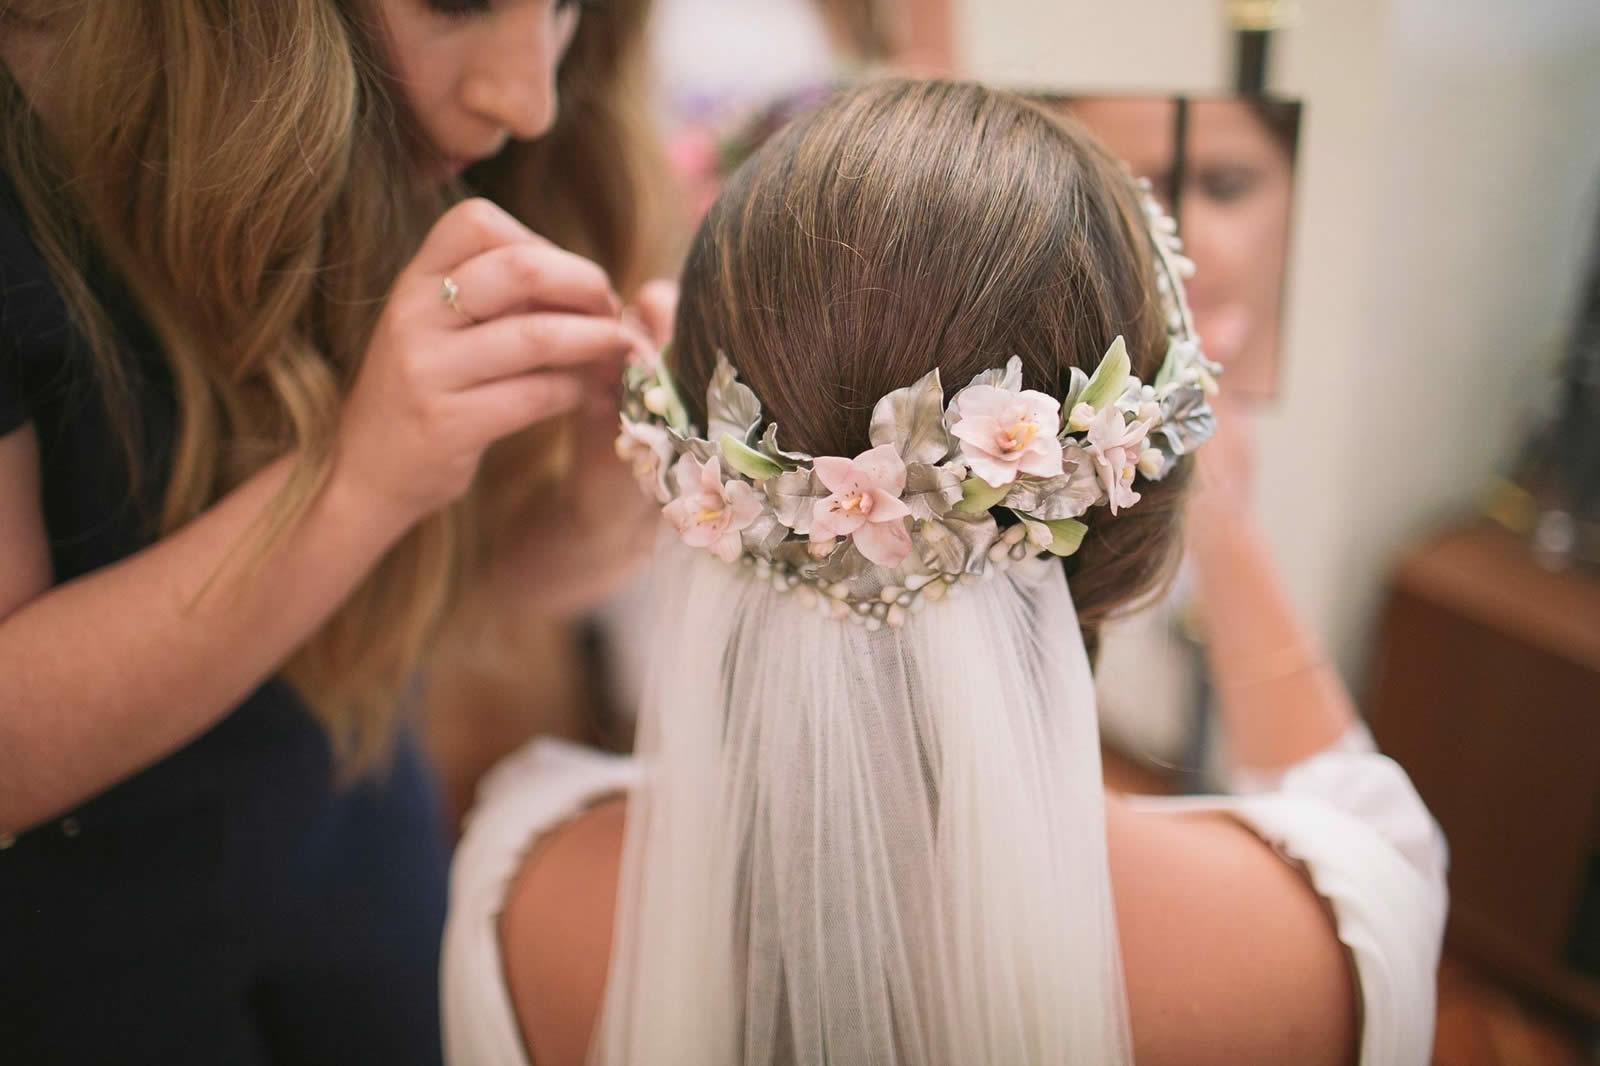 mimoki-boutique-wedding-custom-made-headdress